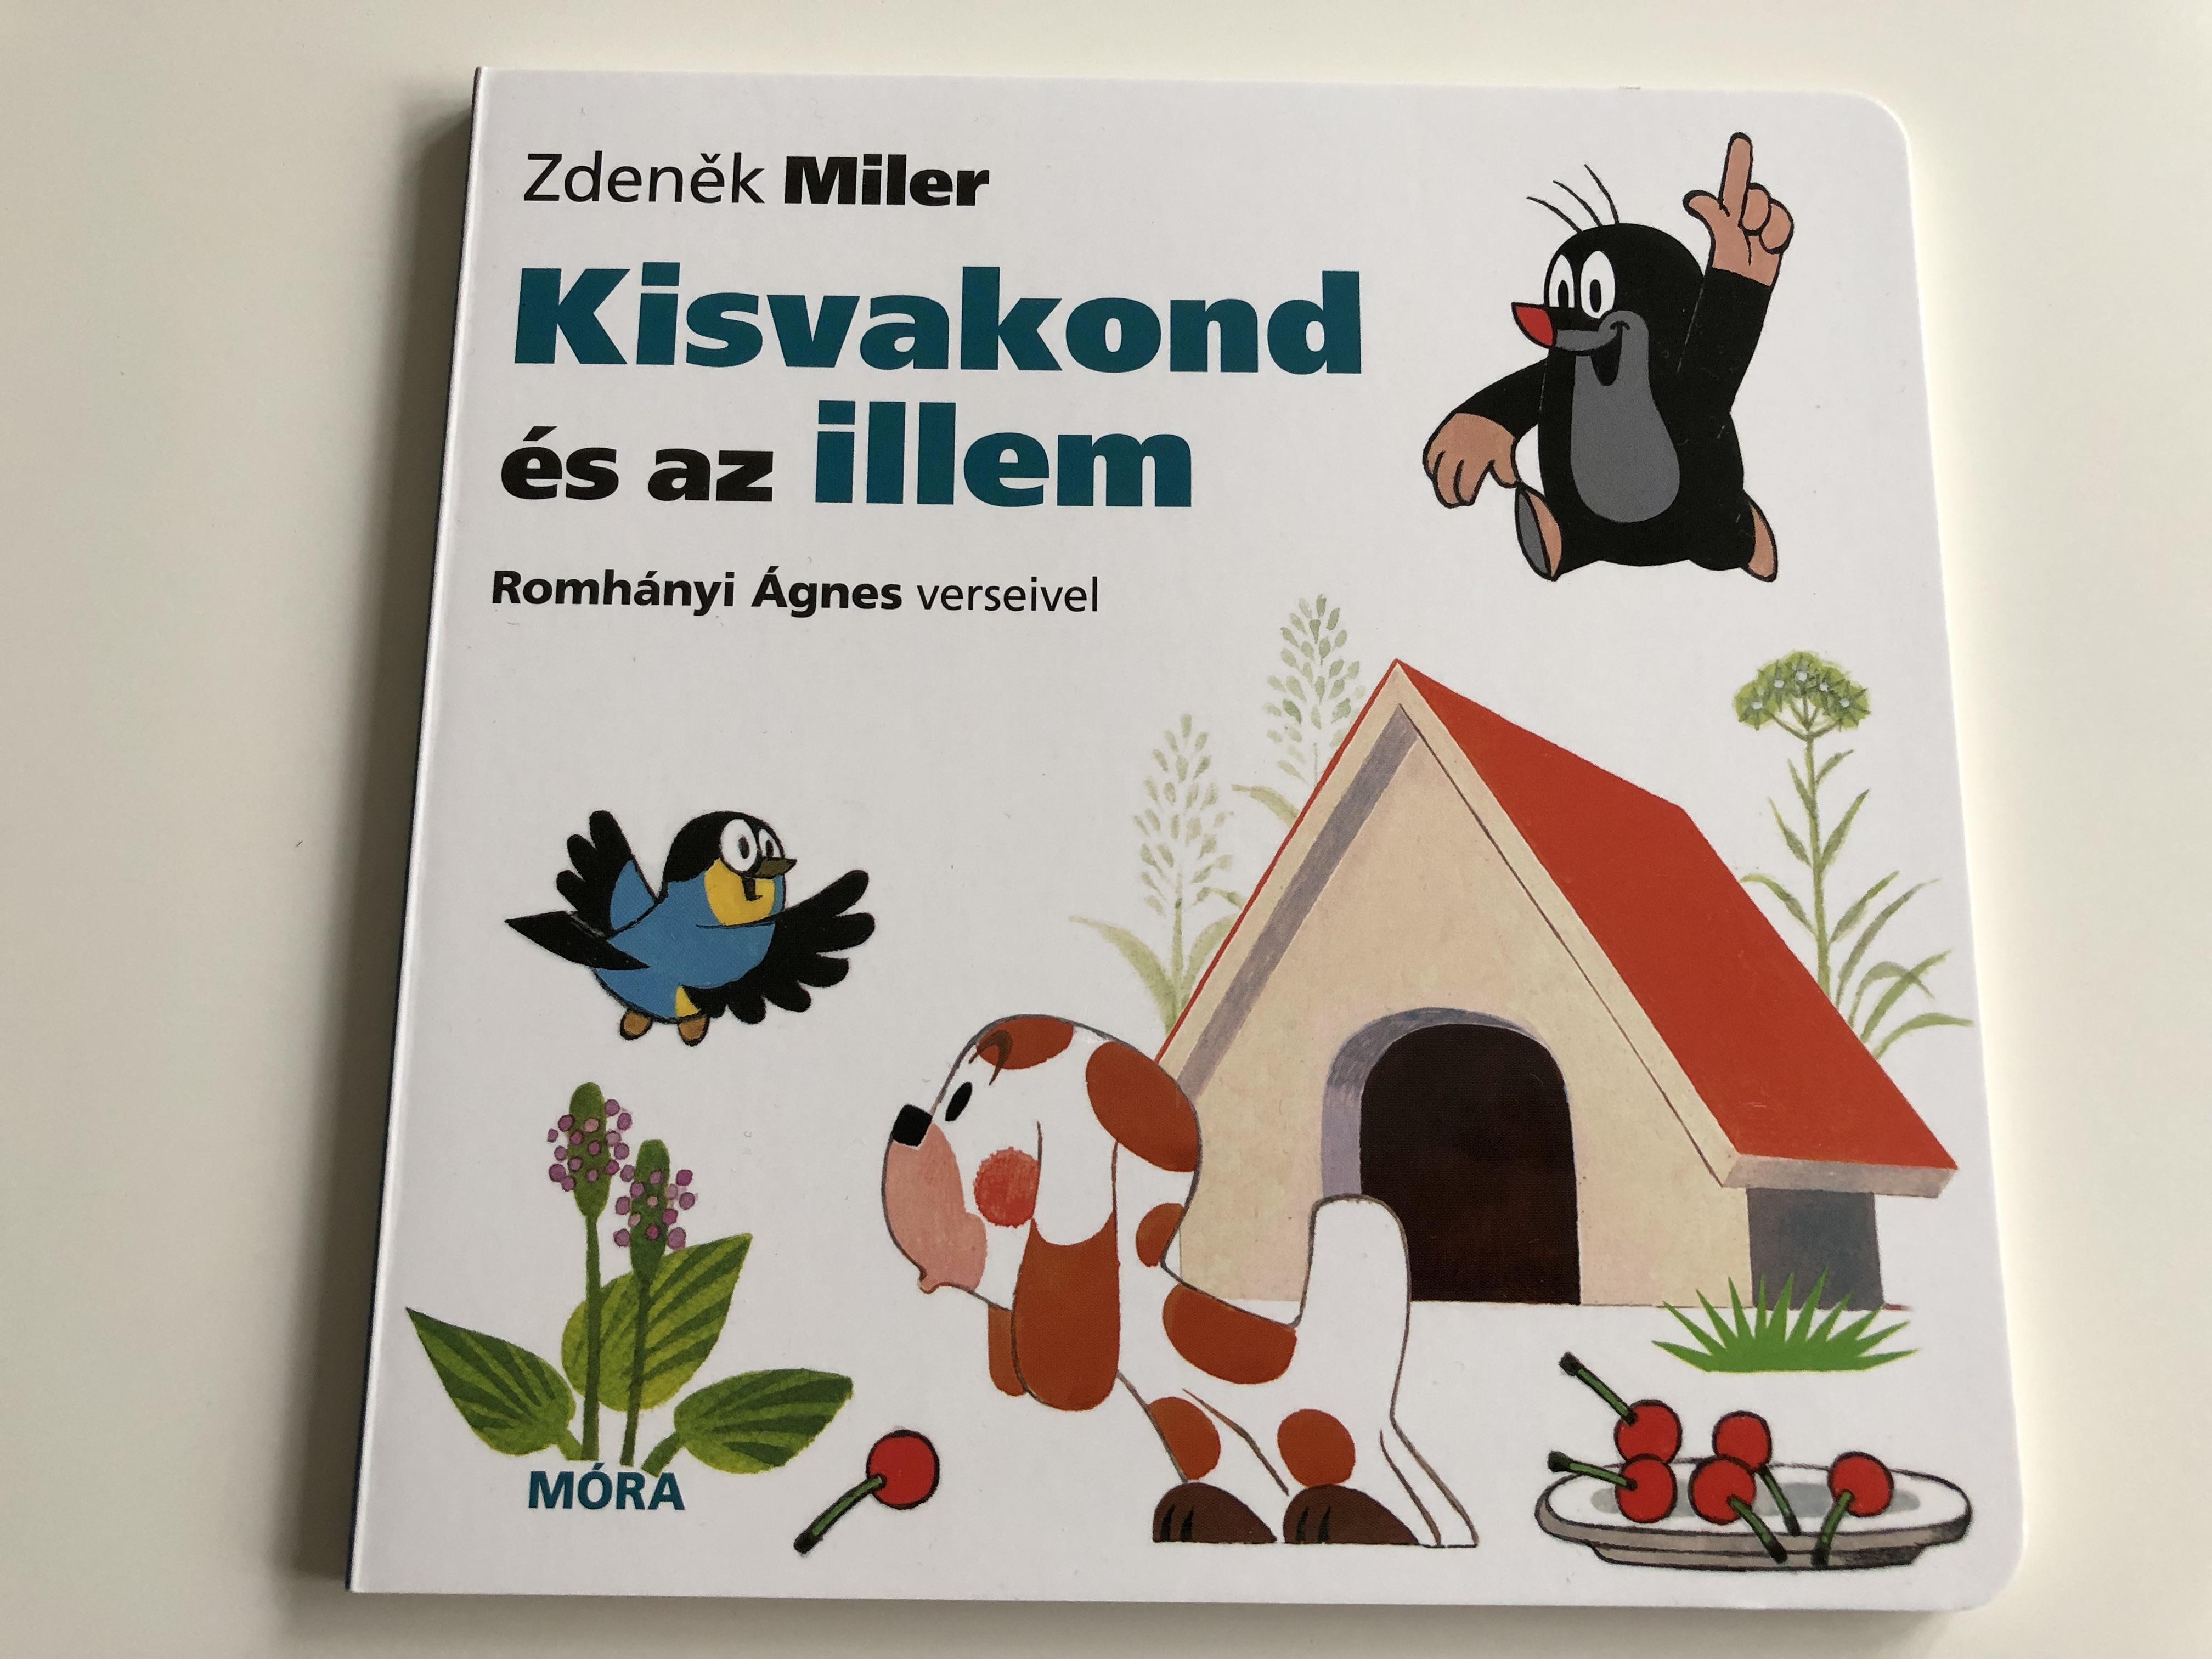 kisvakond-s-az-illem-krtek-and-politeness-author-zden-k-miler-with-the-poems-of-romh-nyi-gnes-hungarian-language-edition-book-for-children-1-.jpg